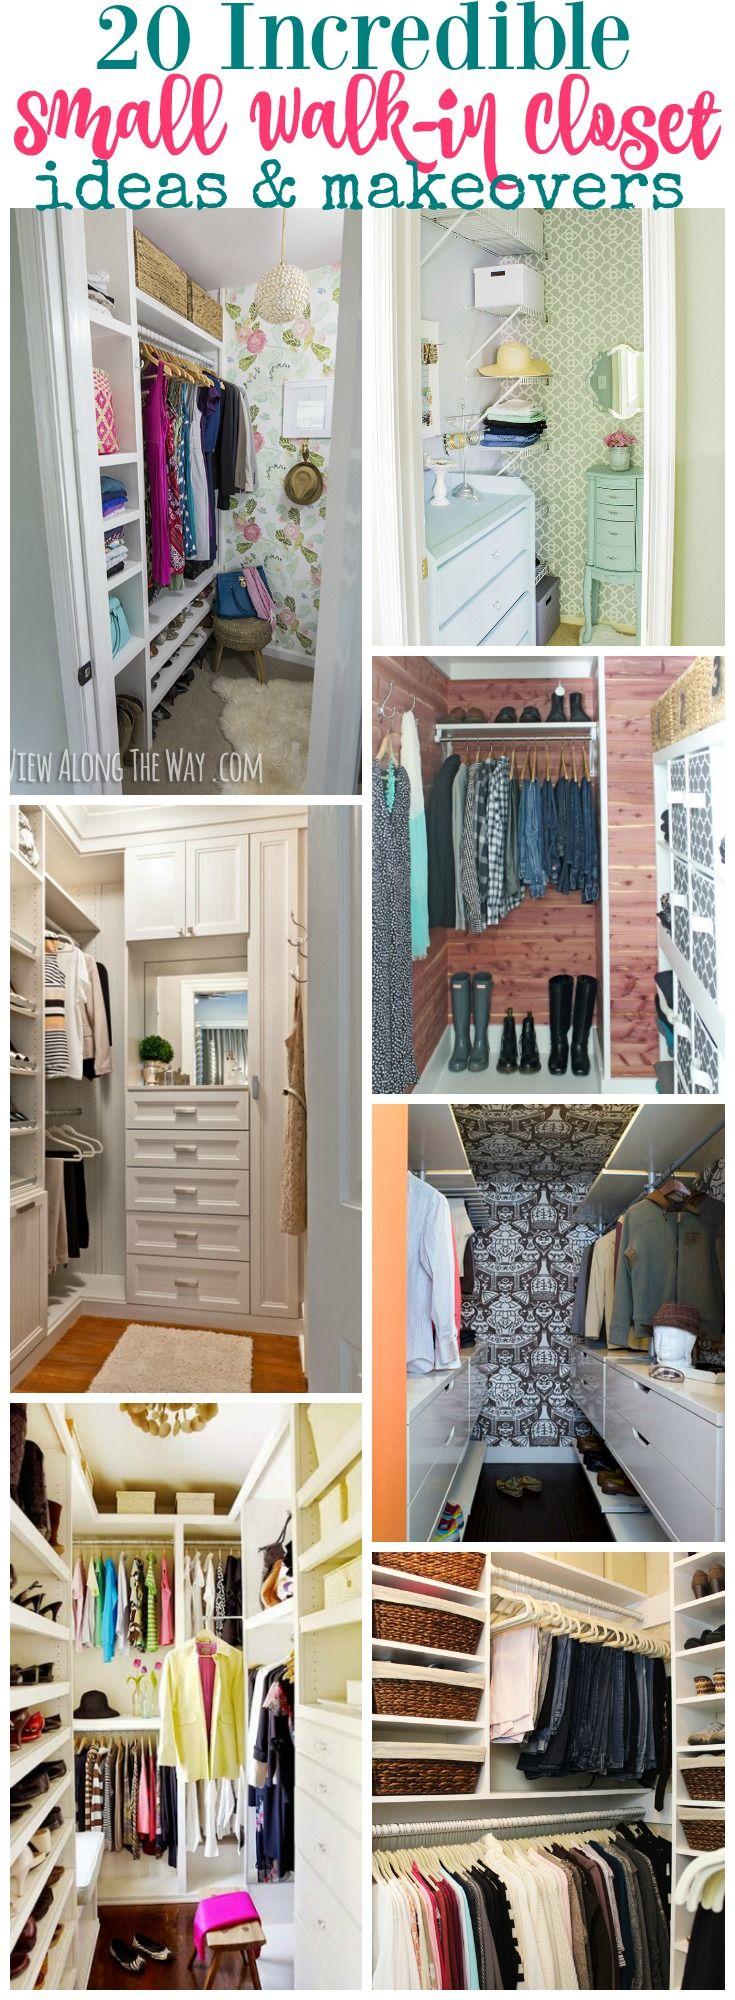 Best 25+ Small closets ideas on Pinterest | Small closet storage ...